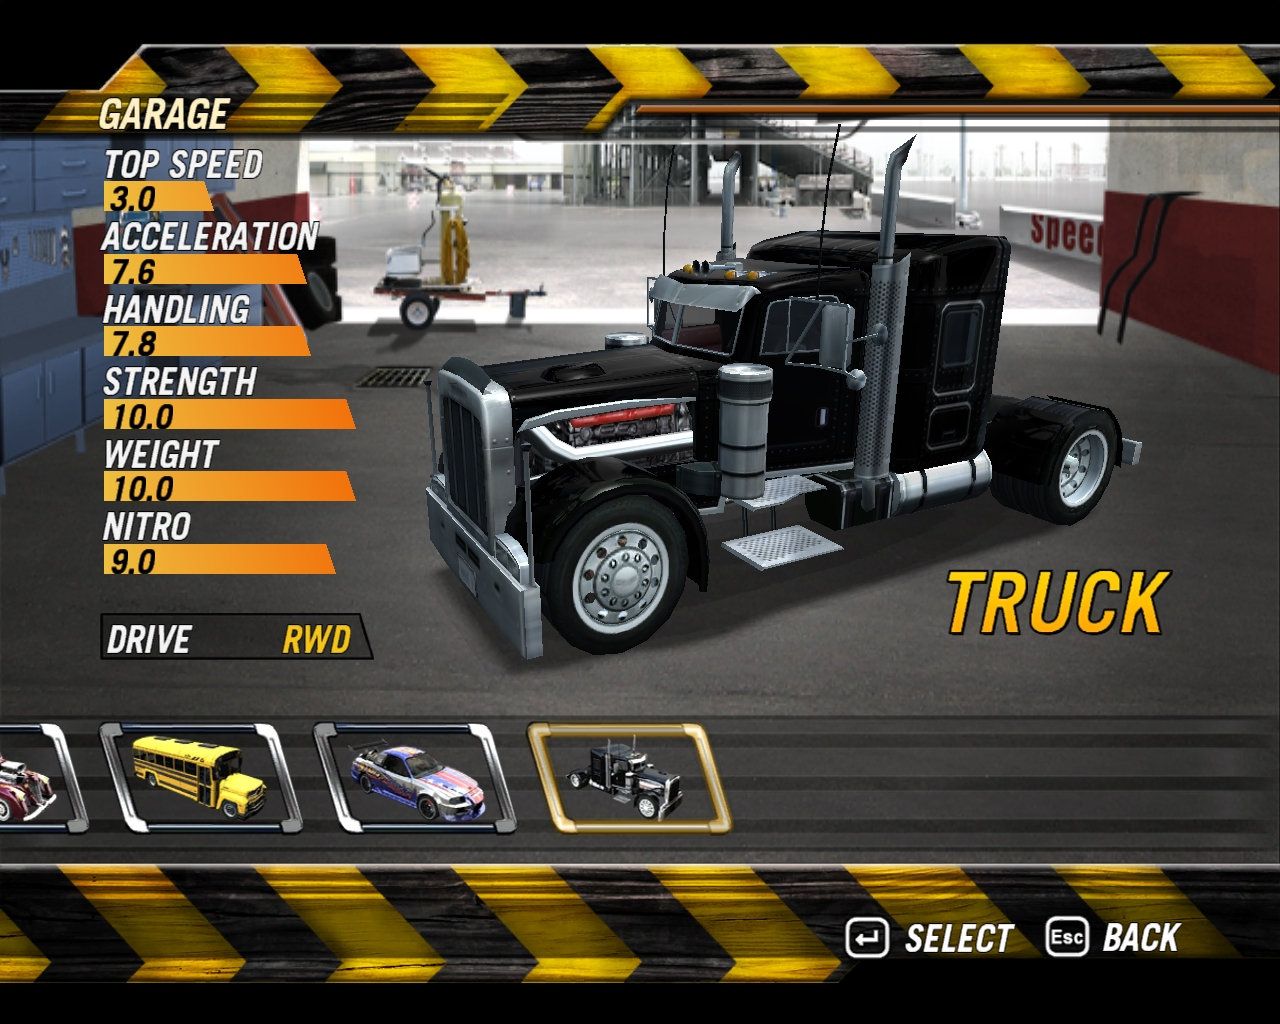 Truck   Flatoutgame Wiki   FANDOM powered by Wikia